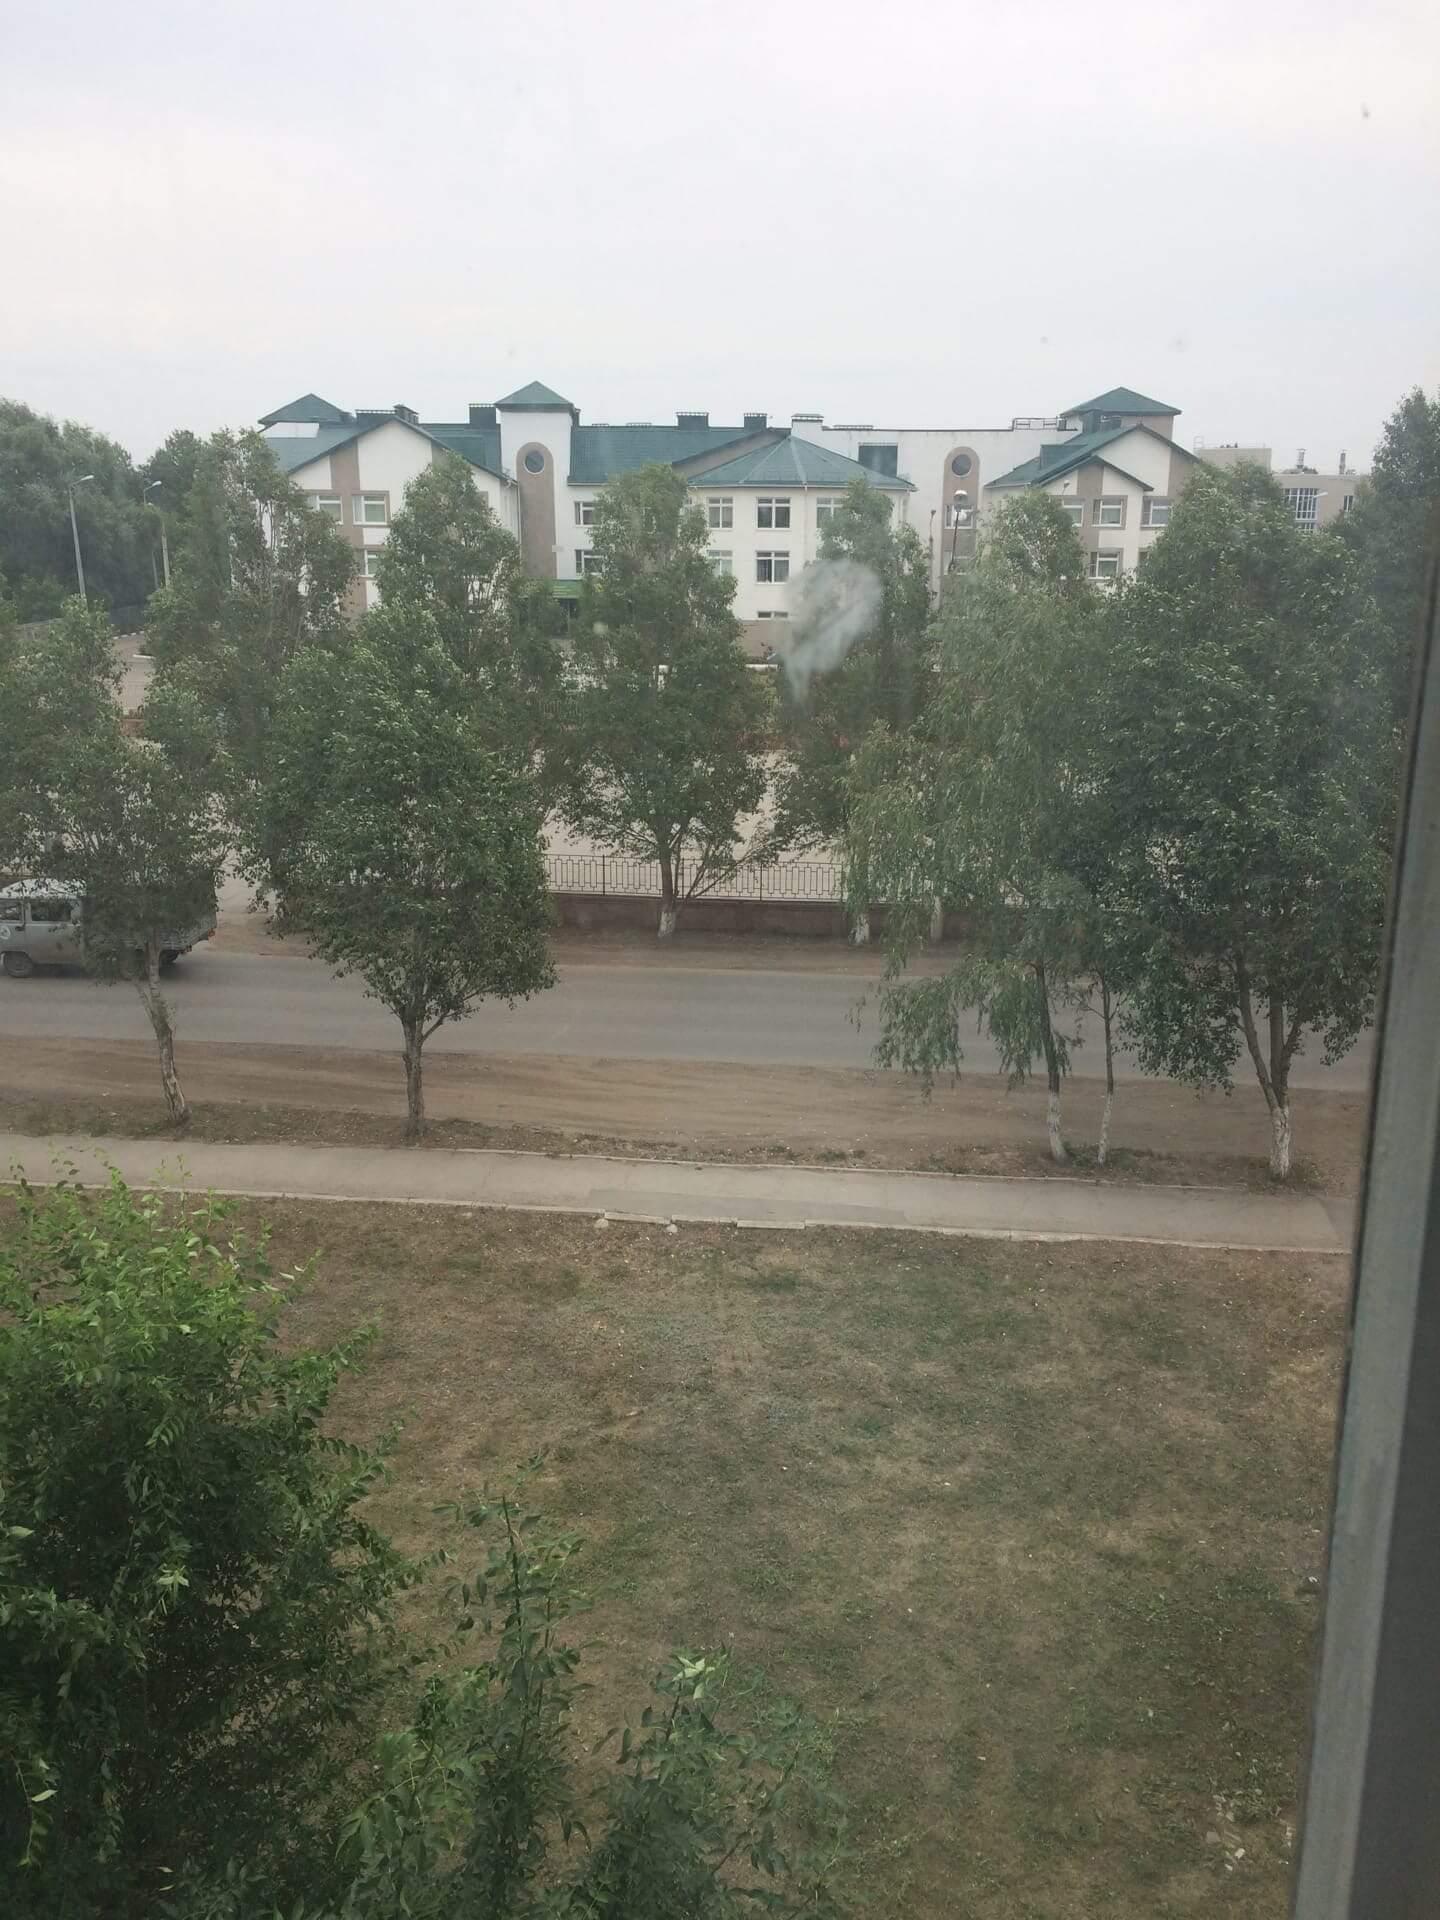 4-х комнатная квартира, г. Кинель (юг), агентство недвижимости Александра Замула